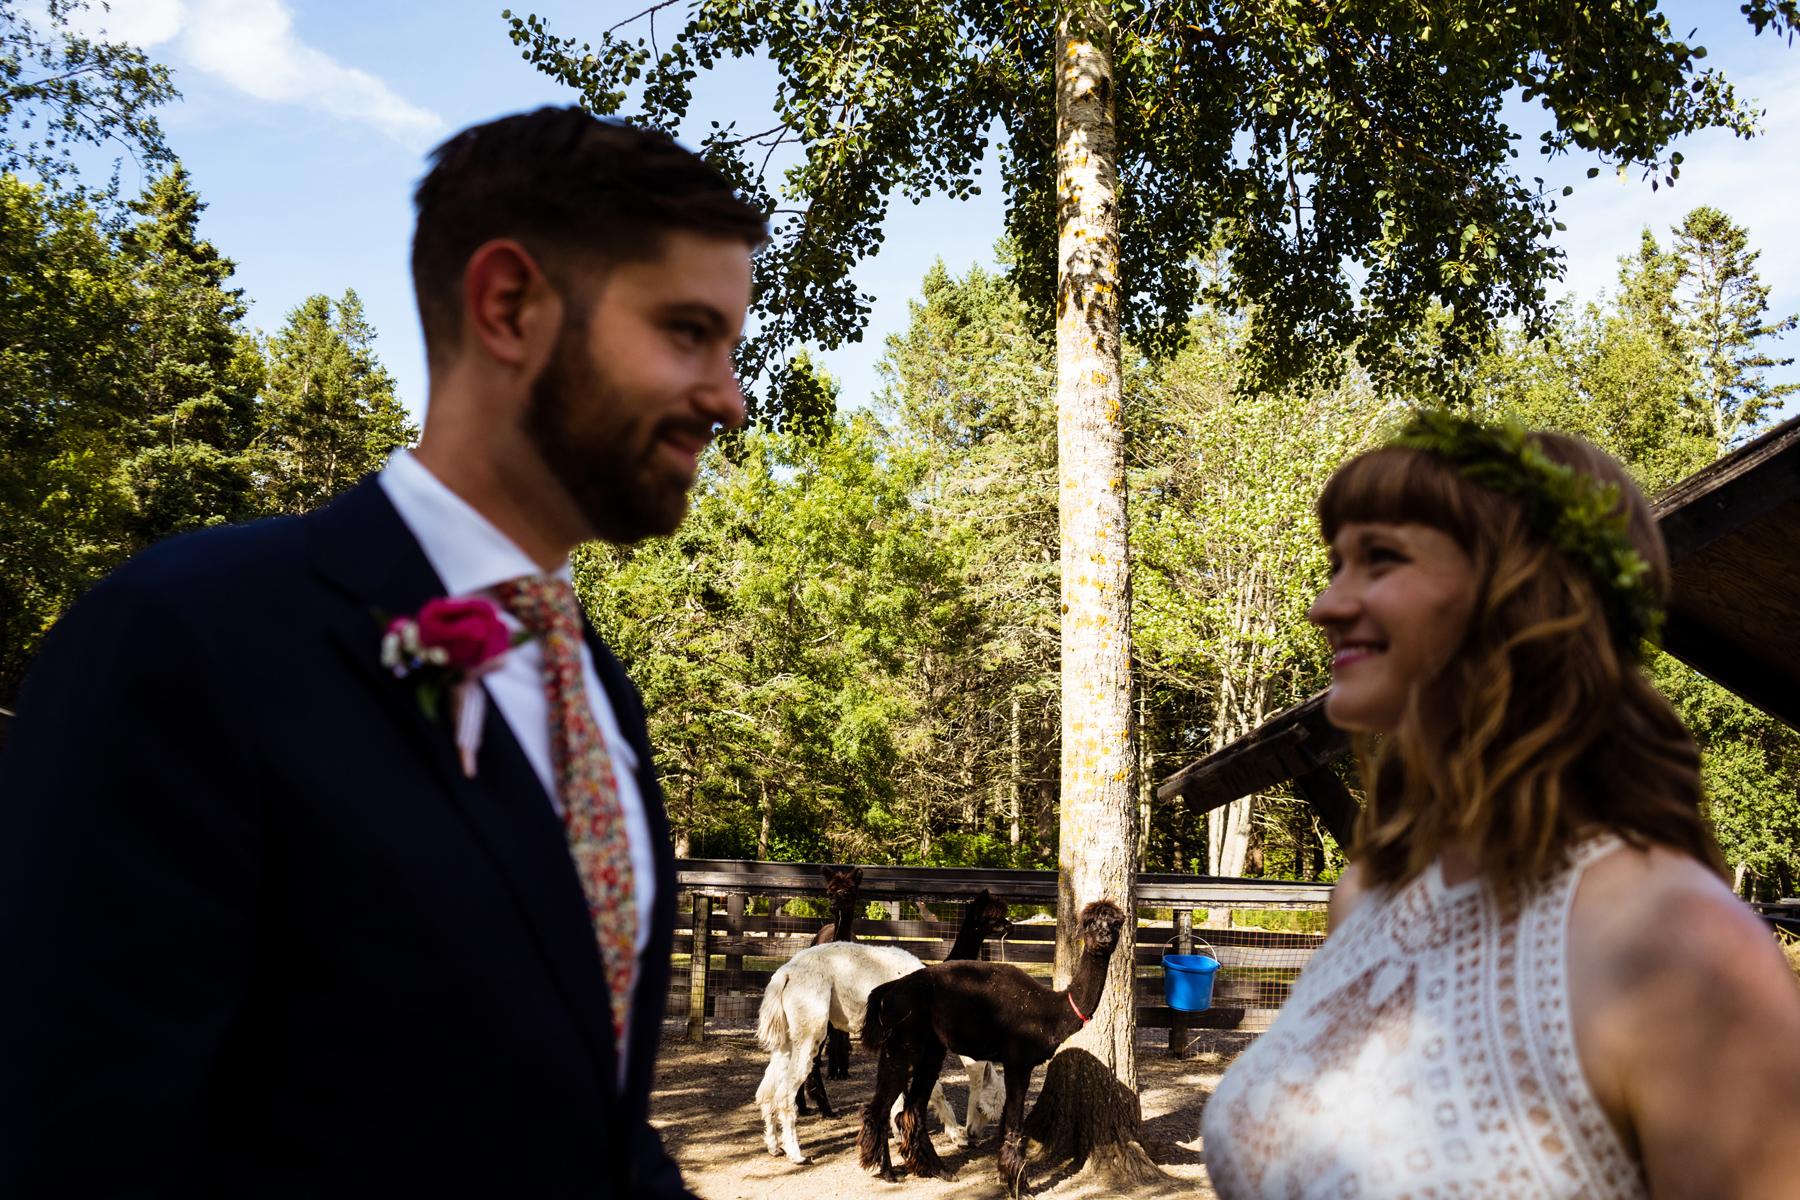 029-st-andrews-kingsbrae-gardens-wedding-photography-kandisebrown-gc2018